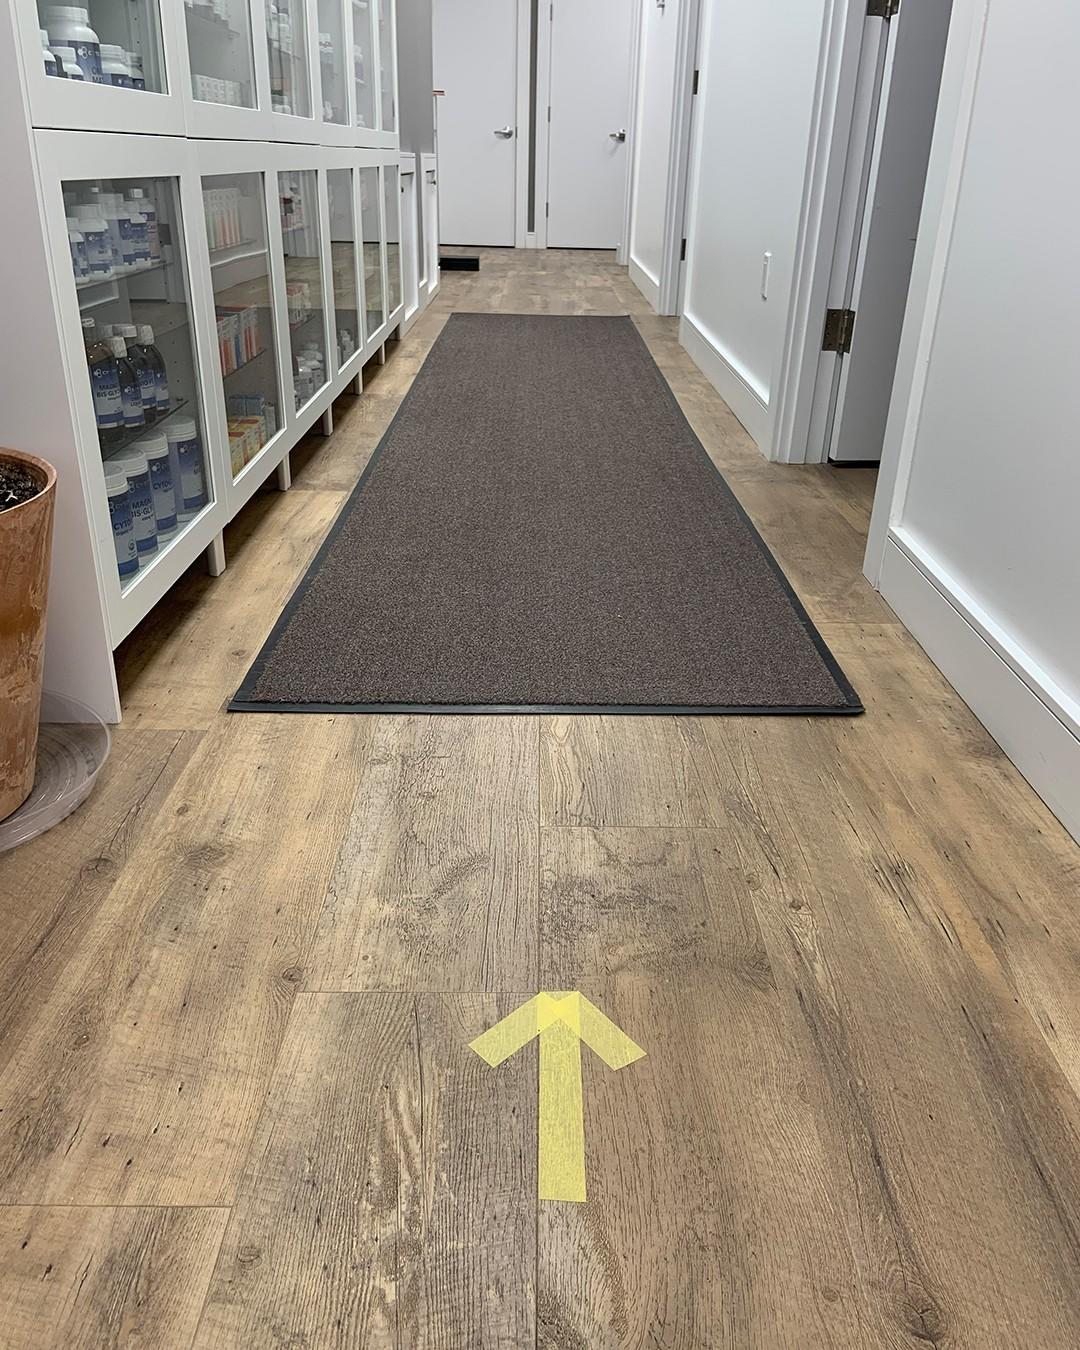 directional arrow on floor